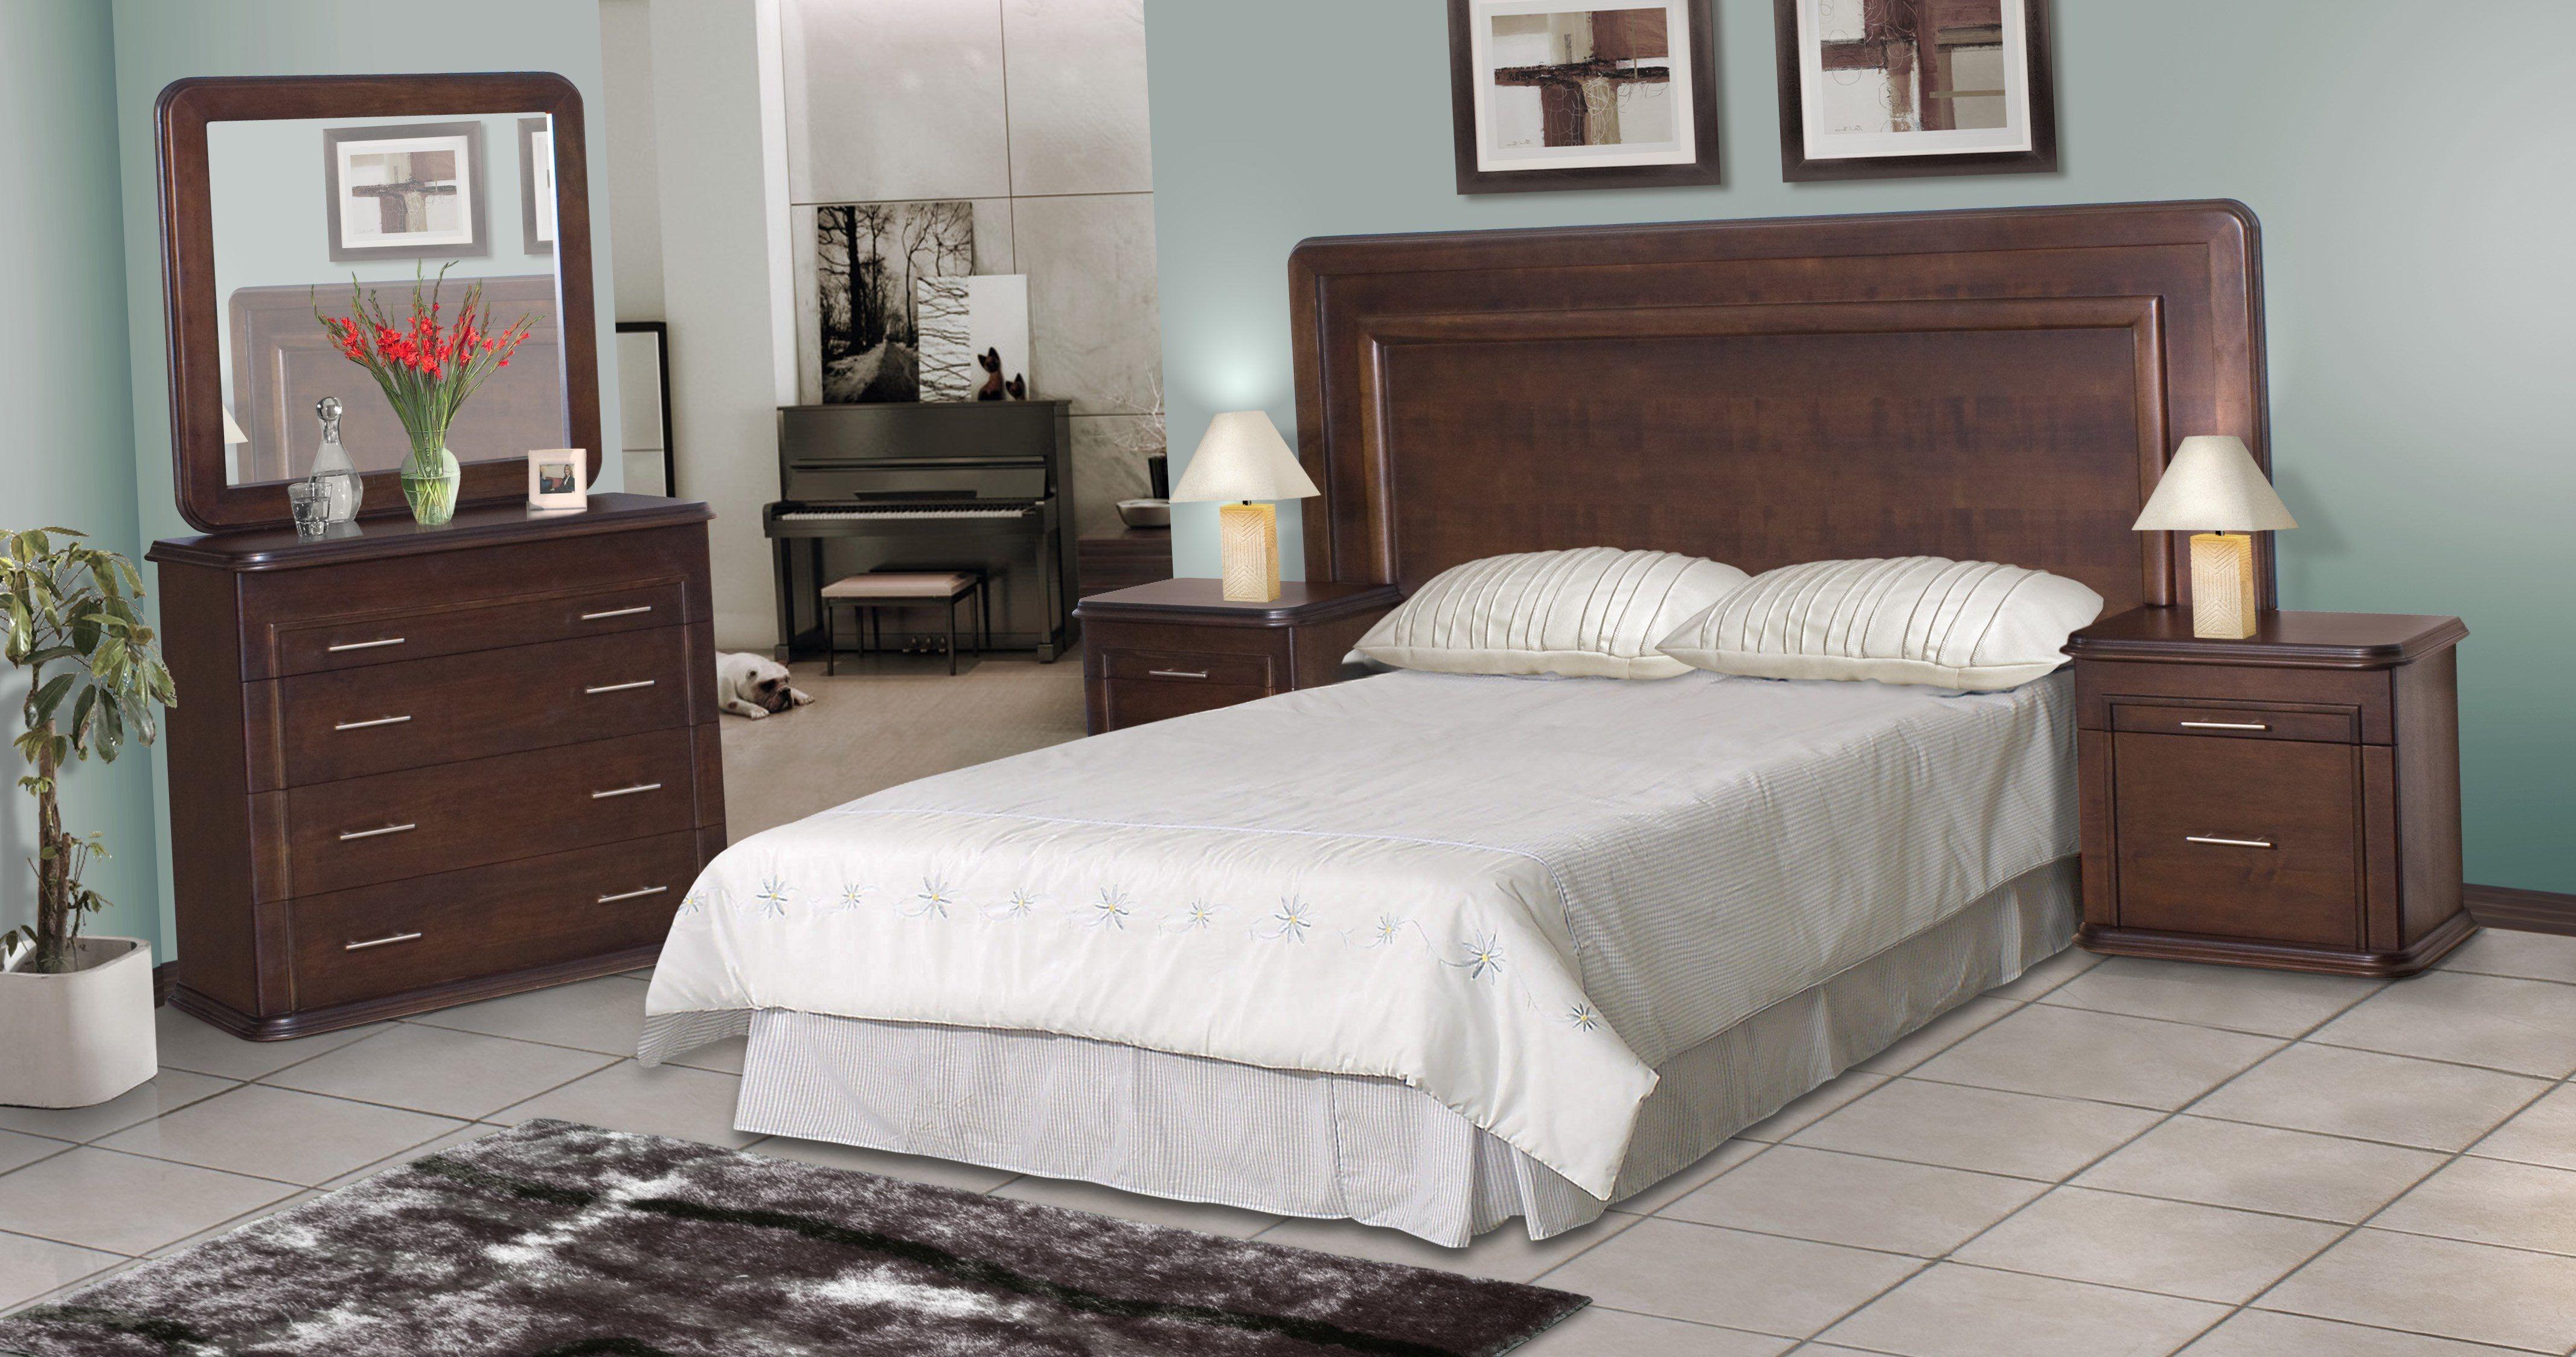 House and home bedroom furniture httpsbedroom design 2017